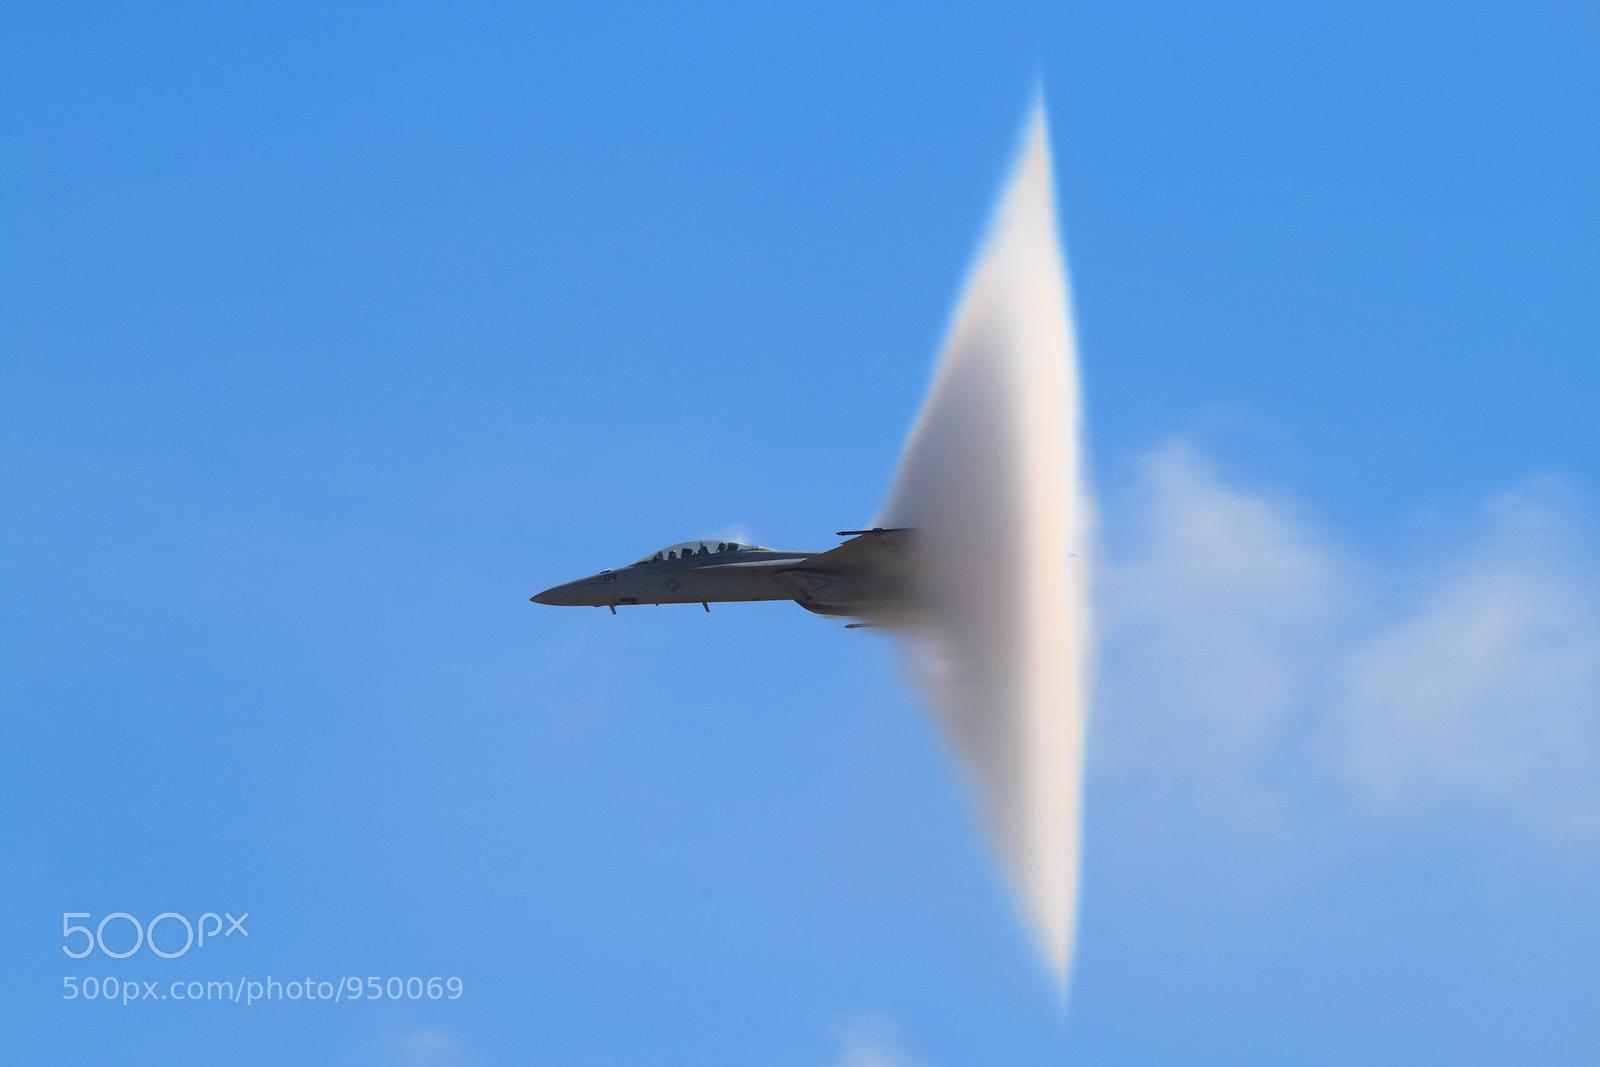 Photograph F-18 Vapor Cone by Steve Skinner on 500px